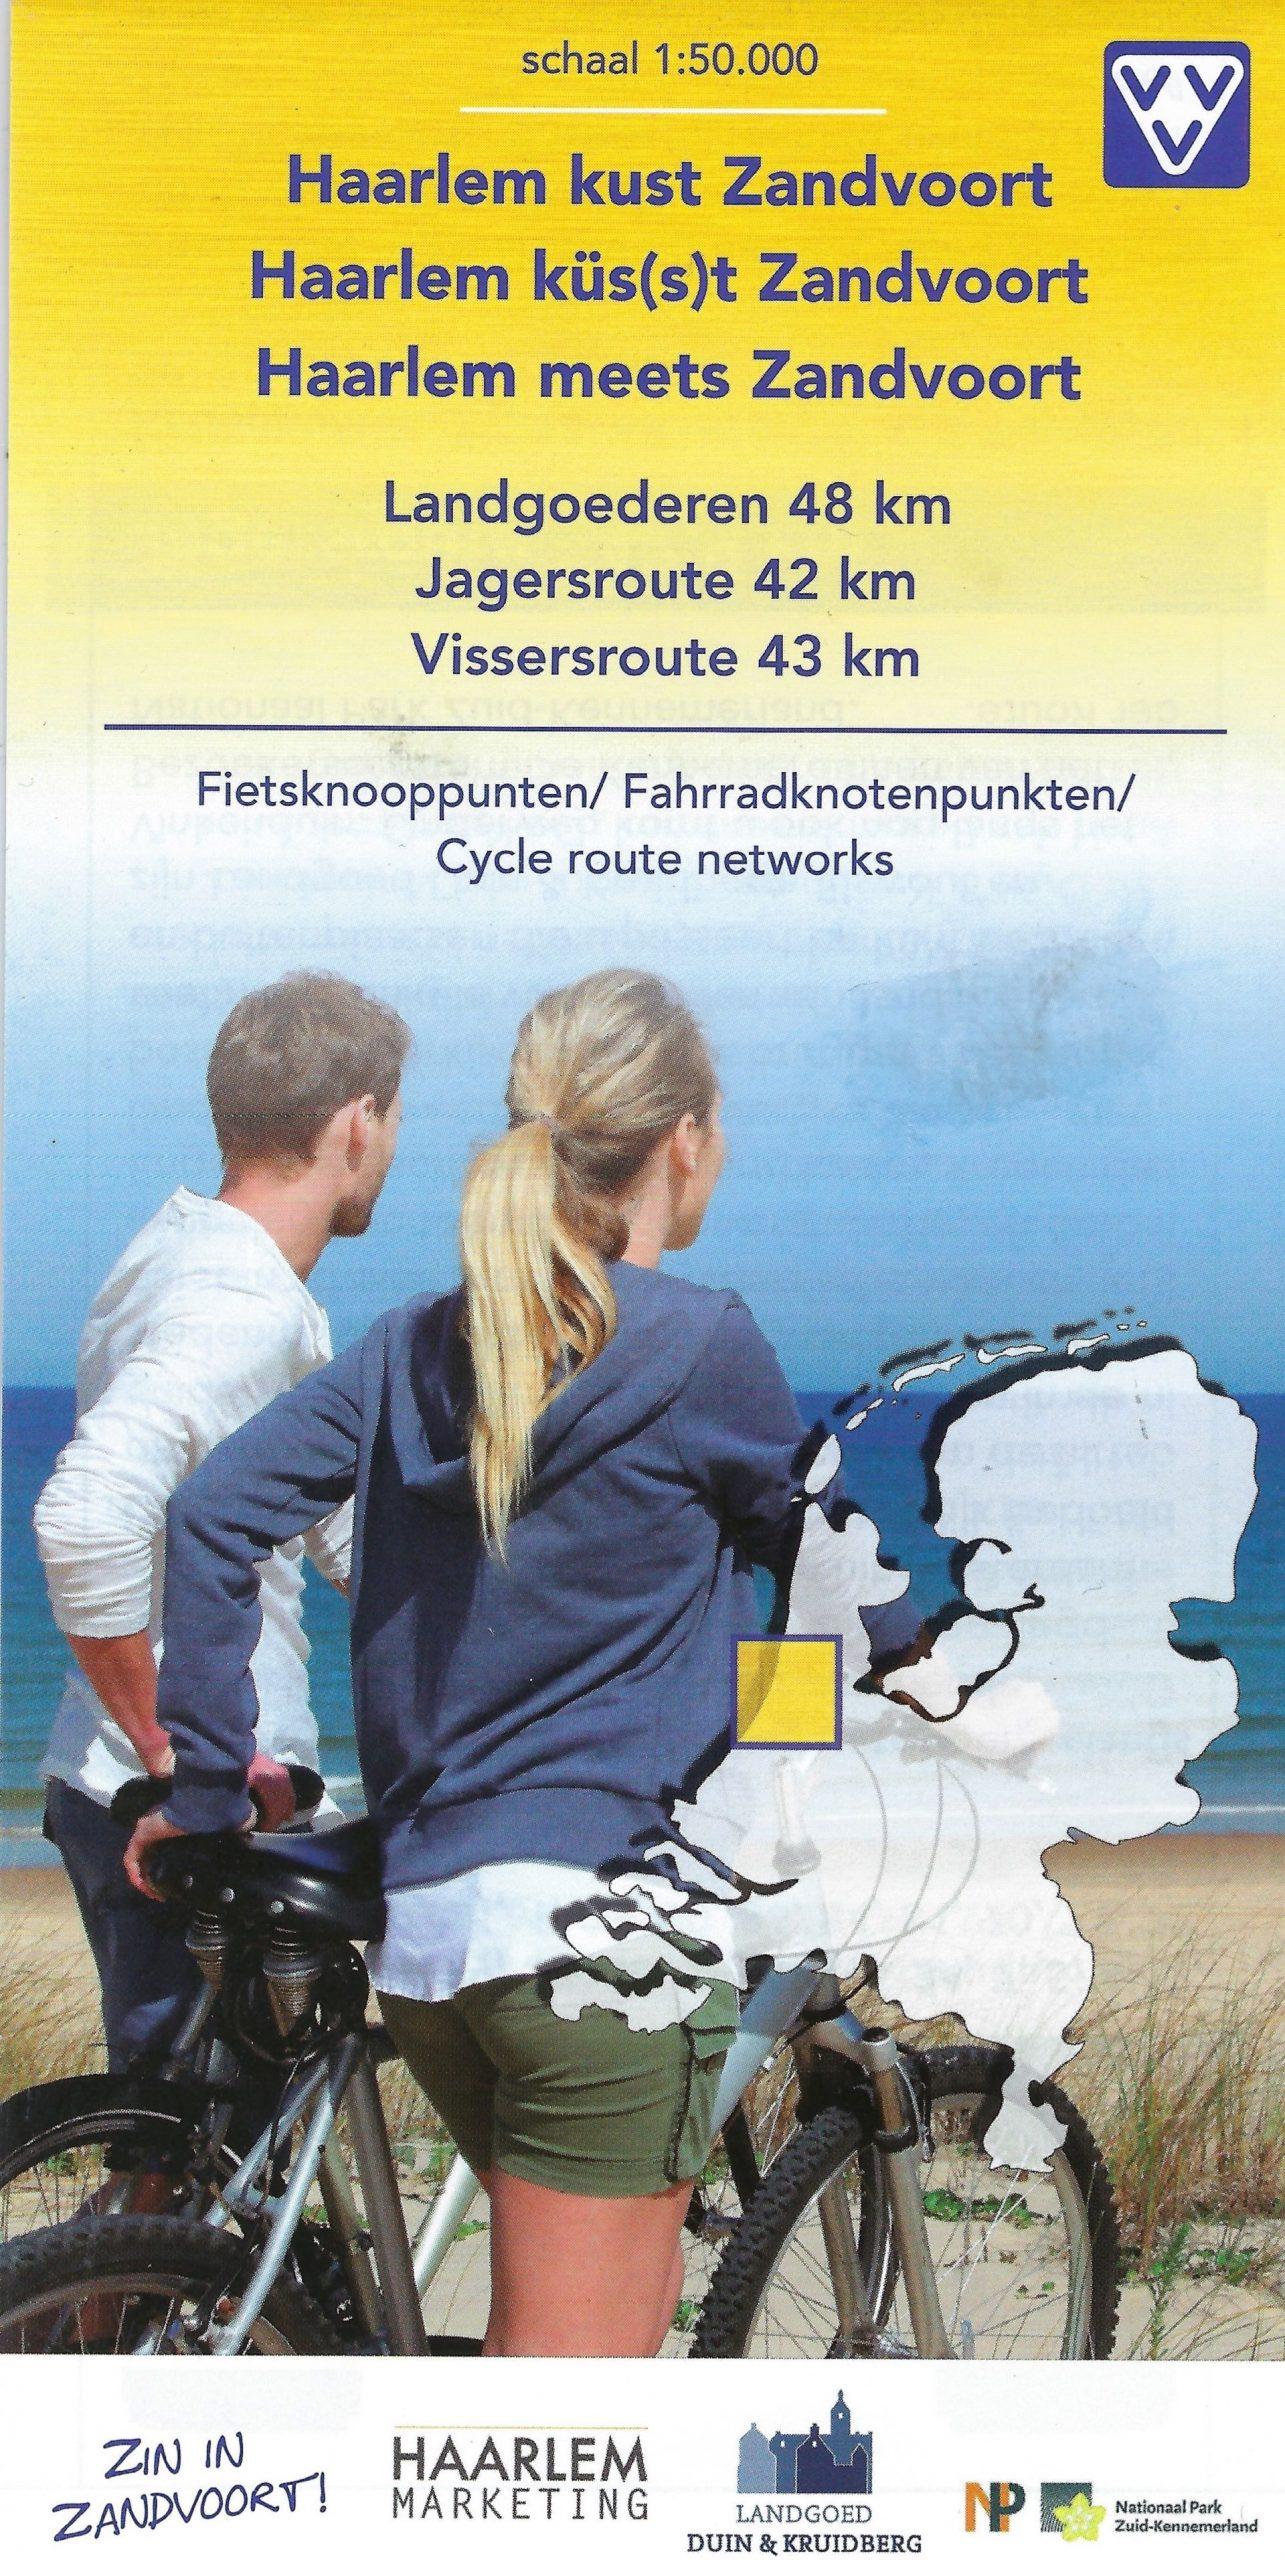 Haarlem_kust_Zandvoort_Knooppunten_route